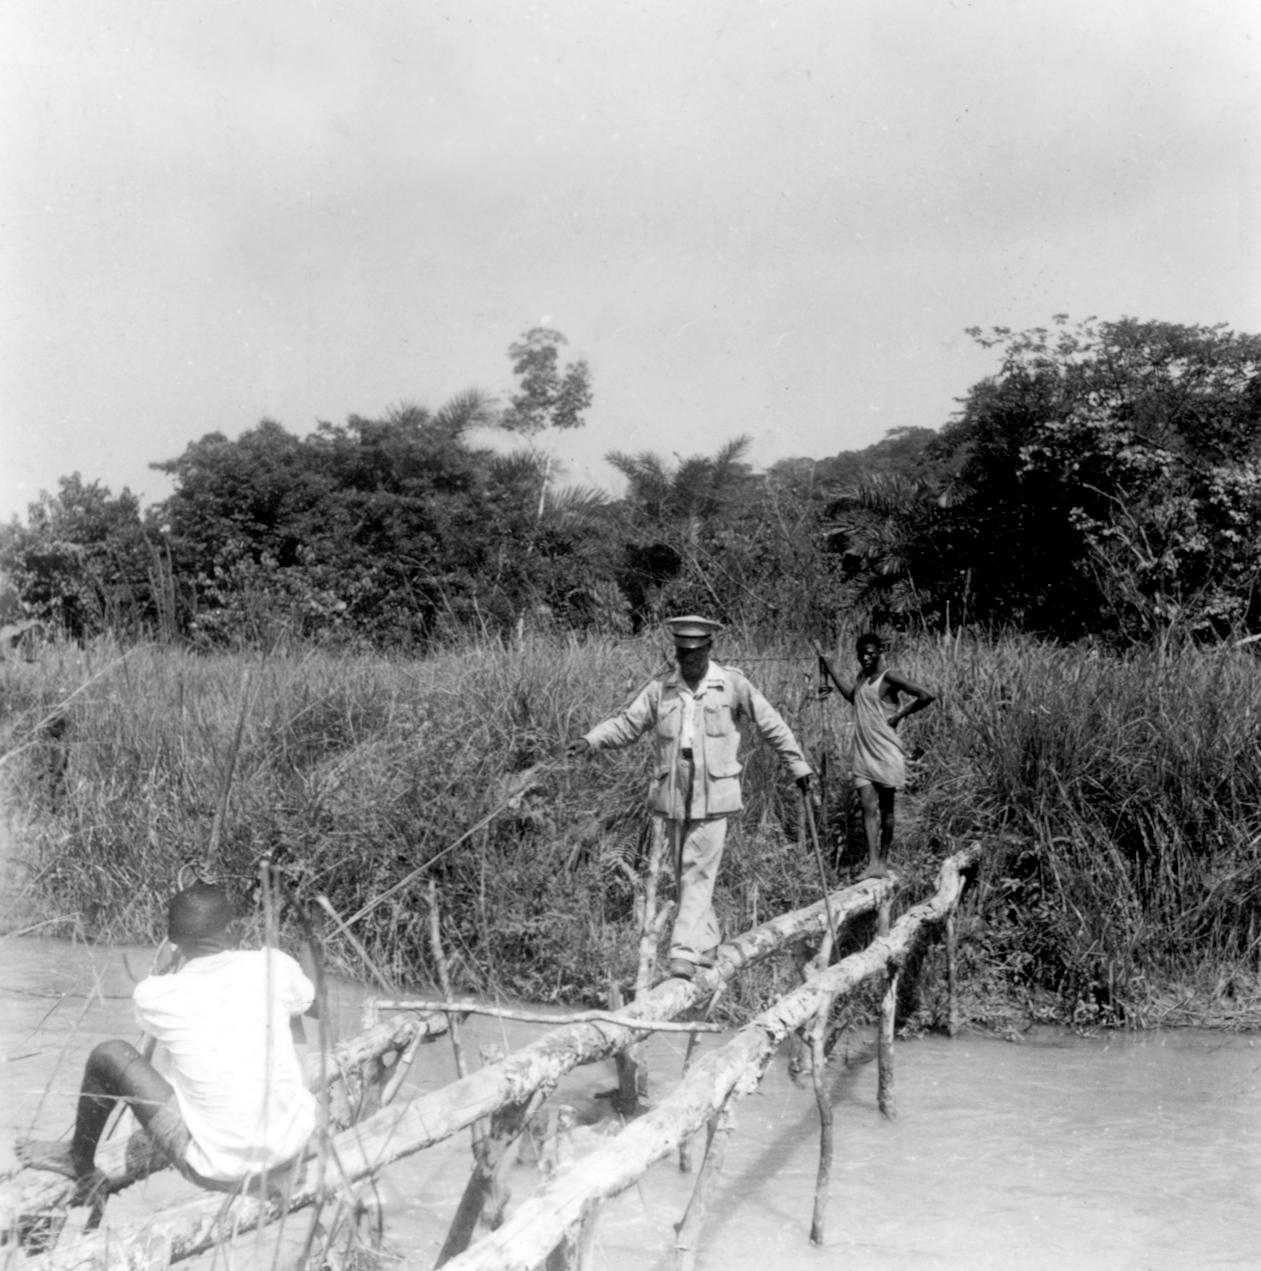 Bridge on Major Footpath in Kuba-Mbeengi Region